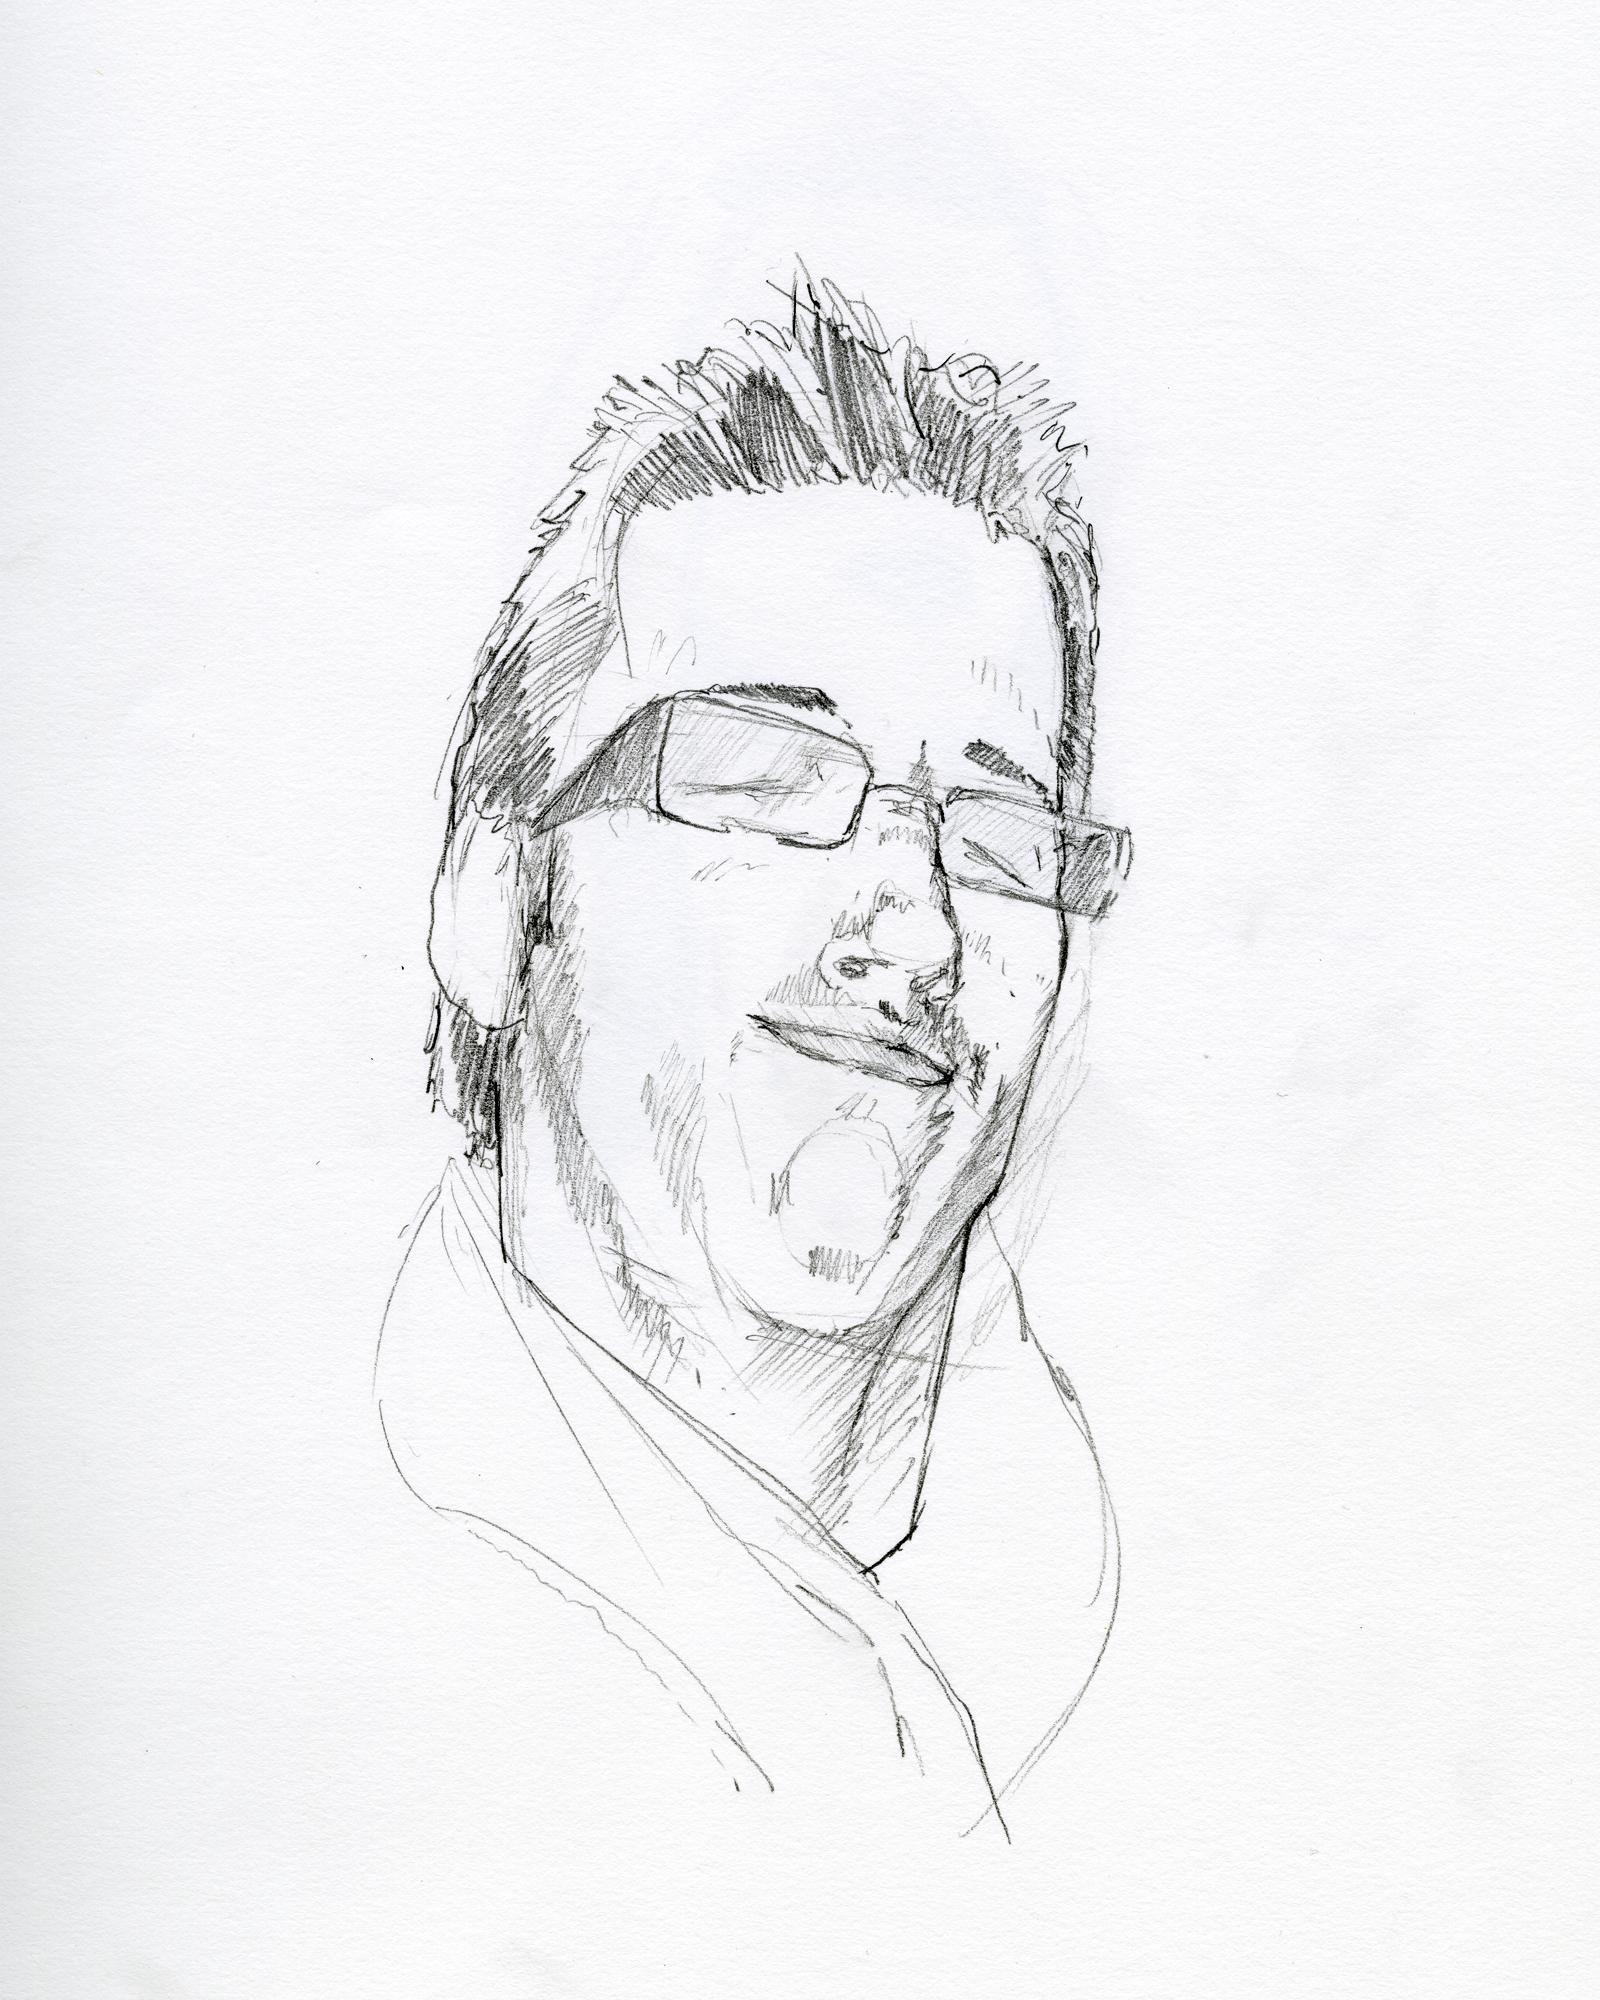 sketch-scott_david-jackowski_alvatron-studio.jpg